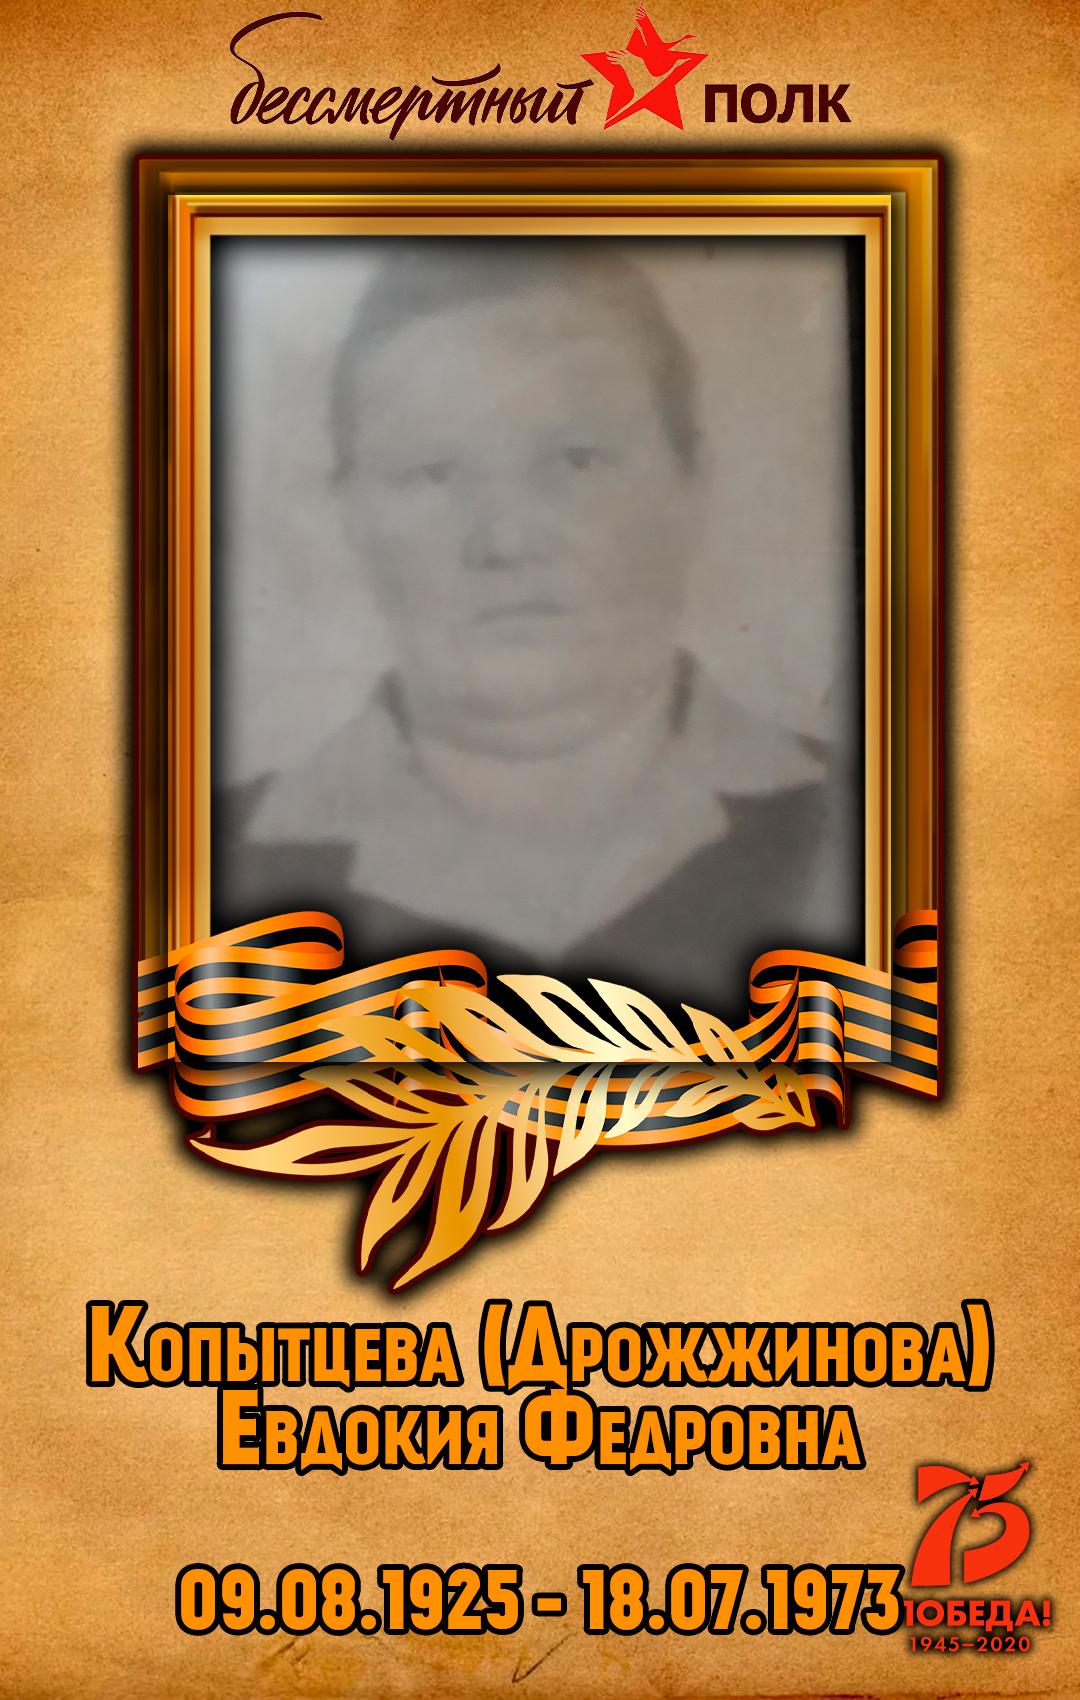 Копытцева-Евдокия-Федровна